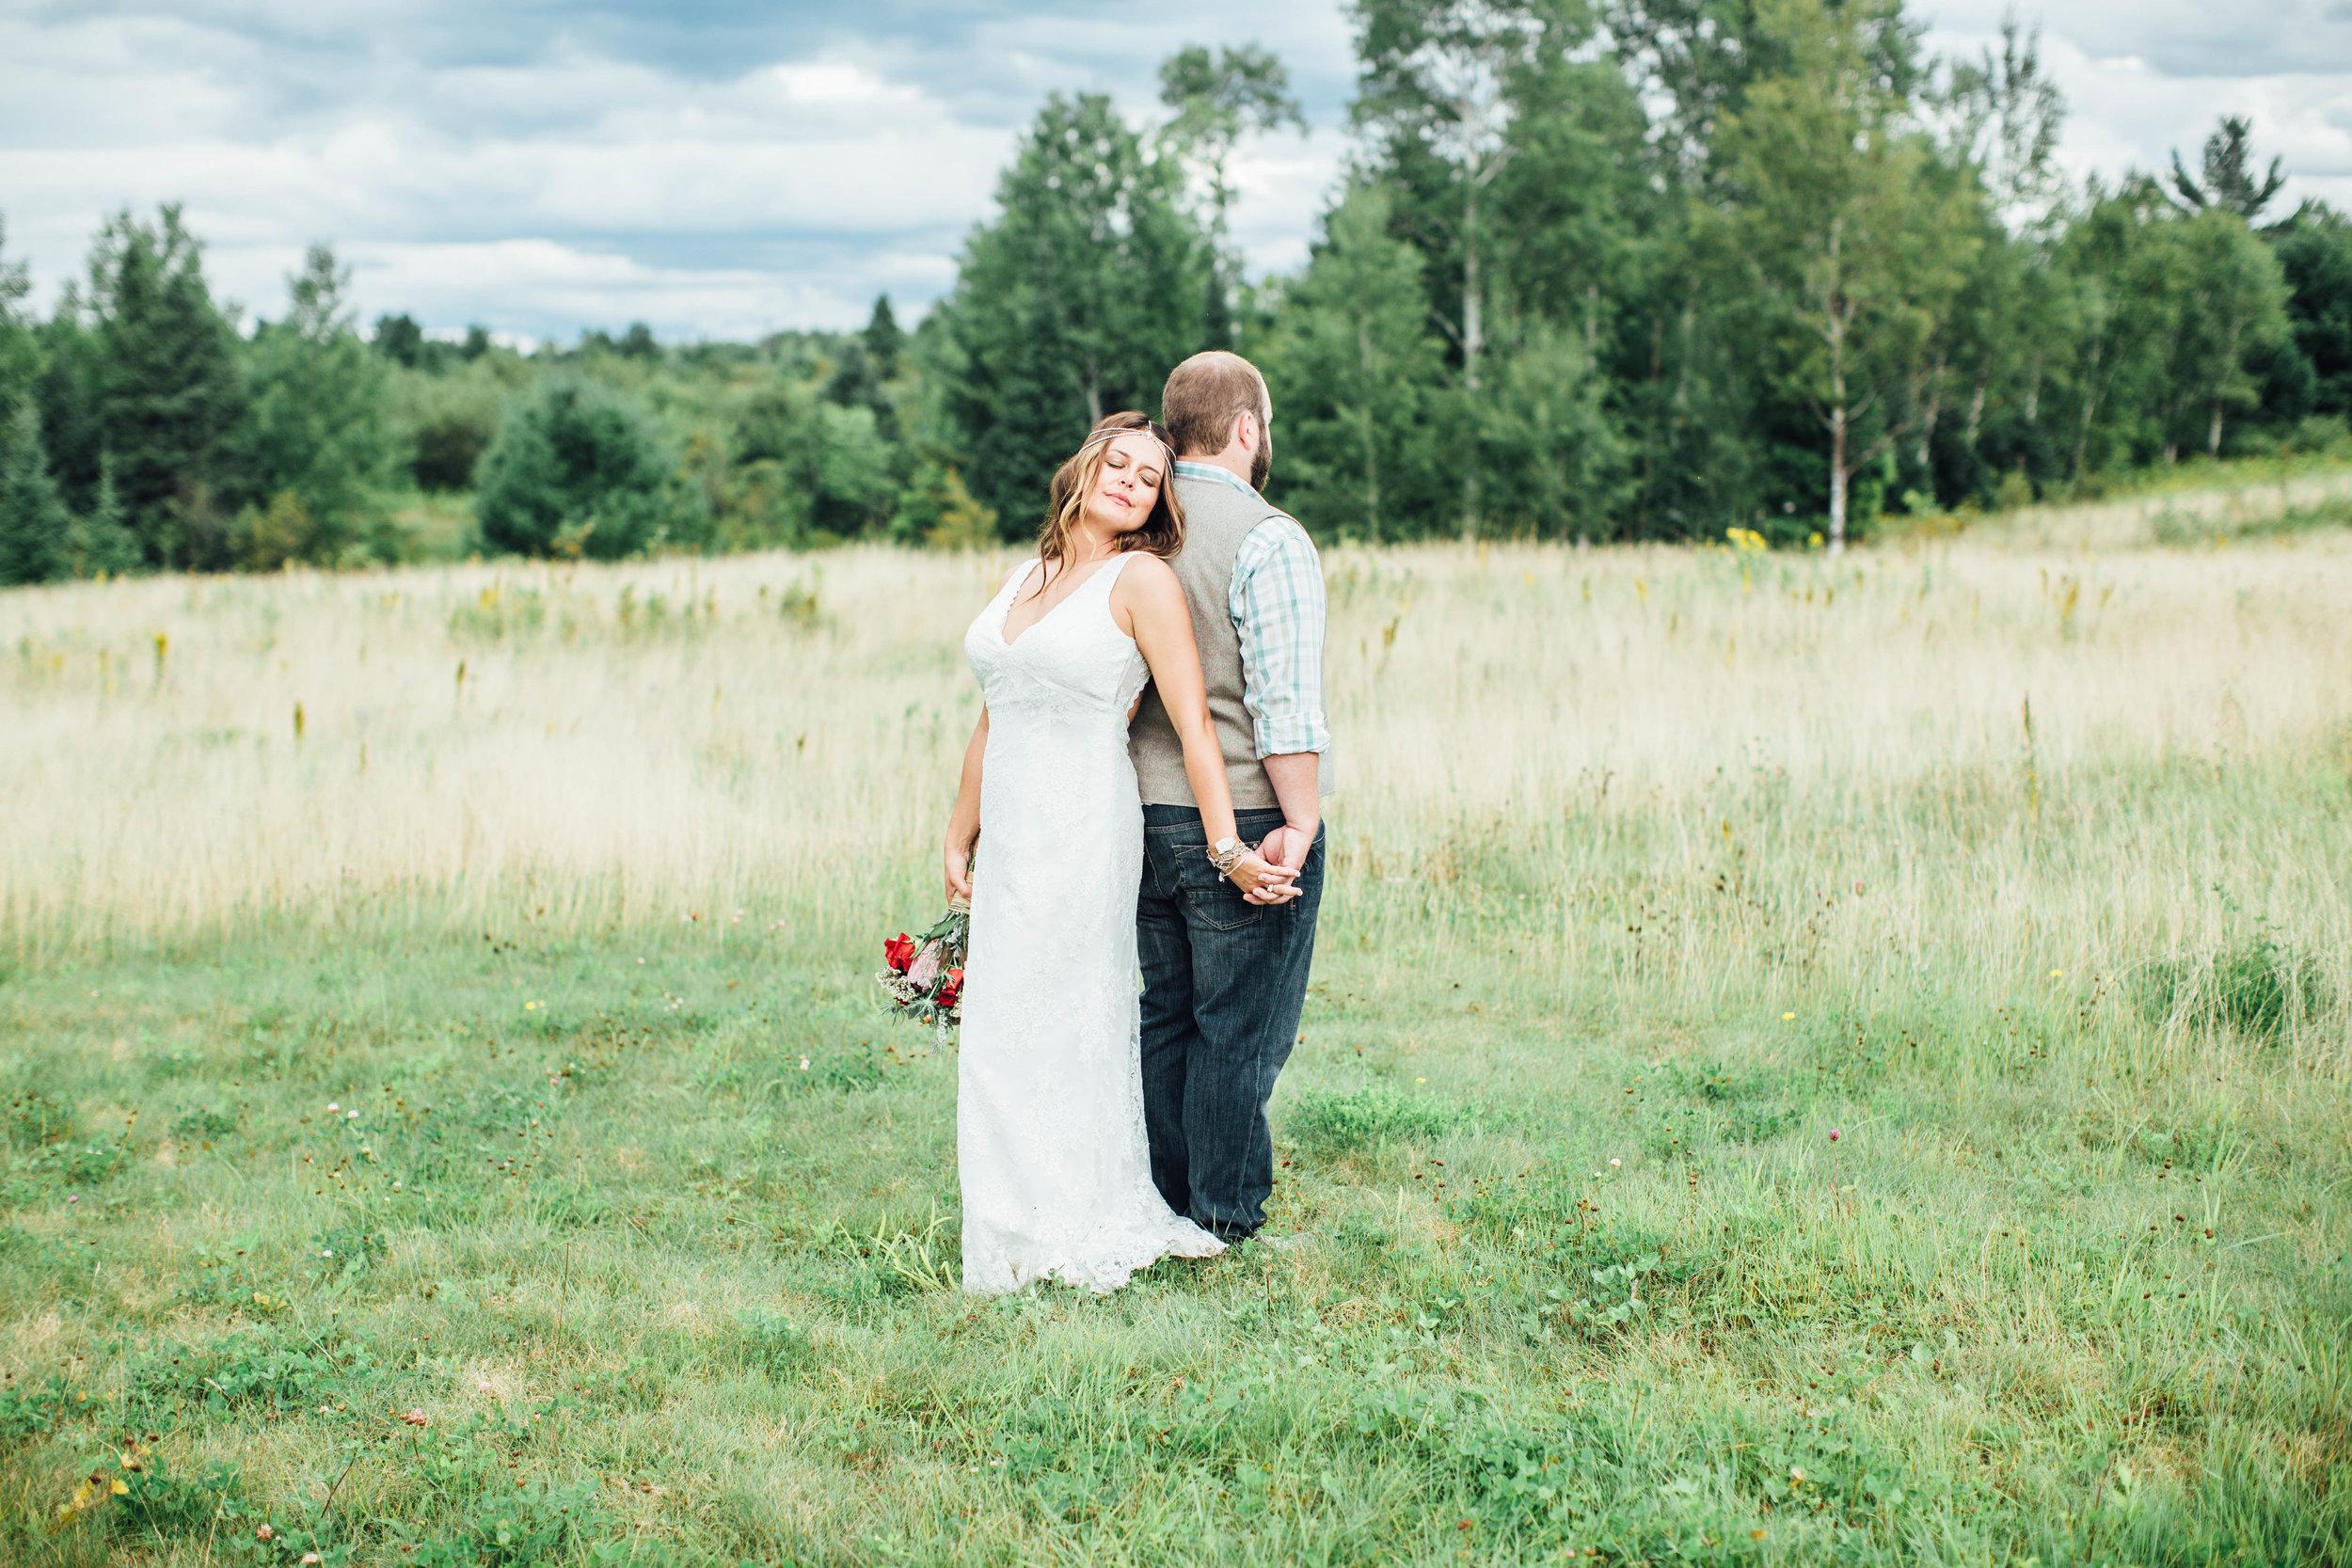 Bohemian Wedding - Sabrina Leigh Studios - Northern Michigan Wedding Photographer075.jpg